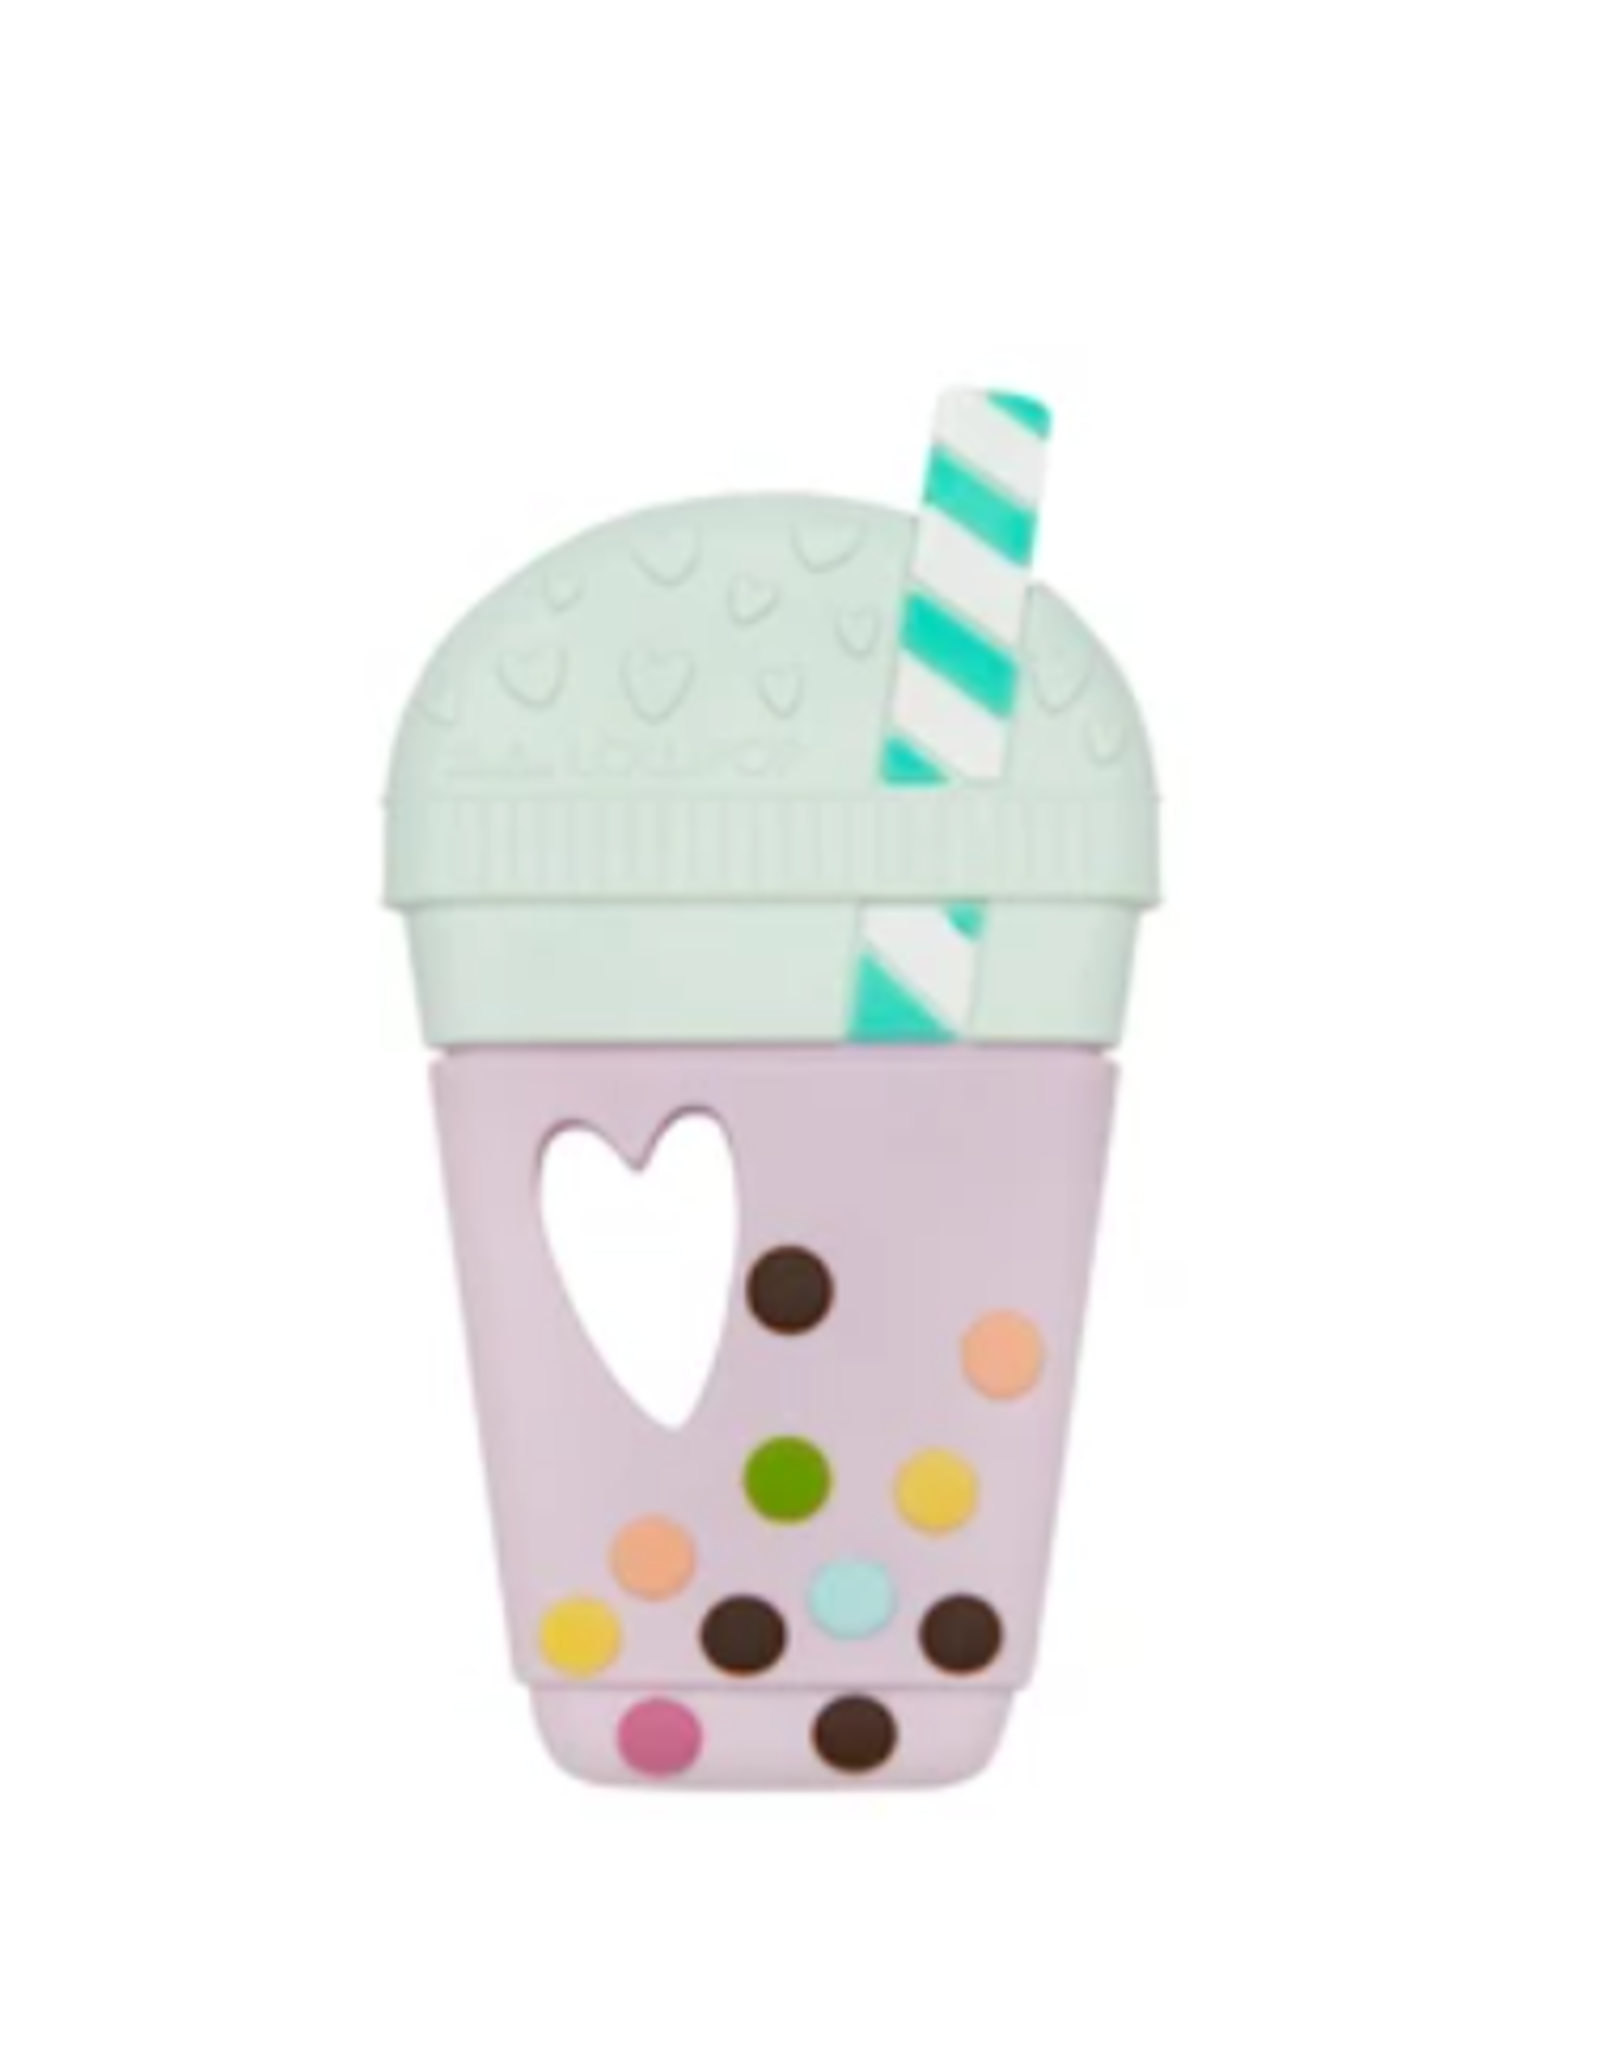 Loulou Lollipop Bubble Tea Silicone Teether